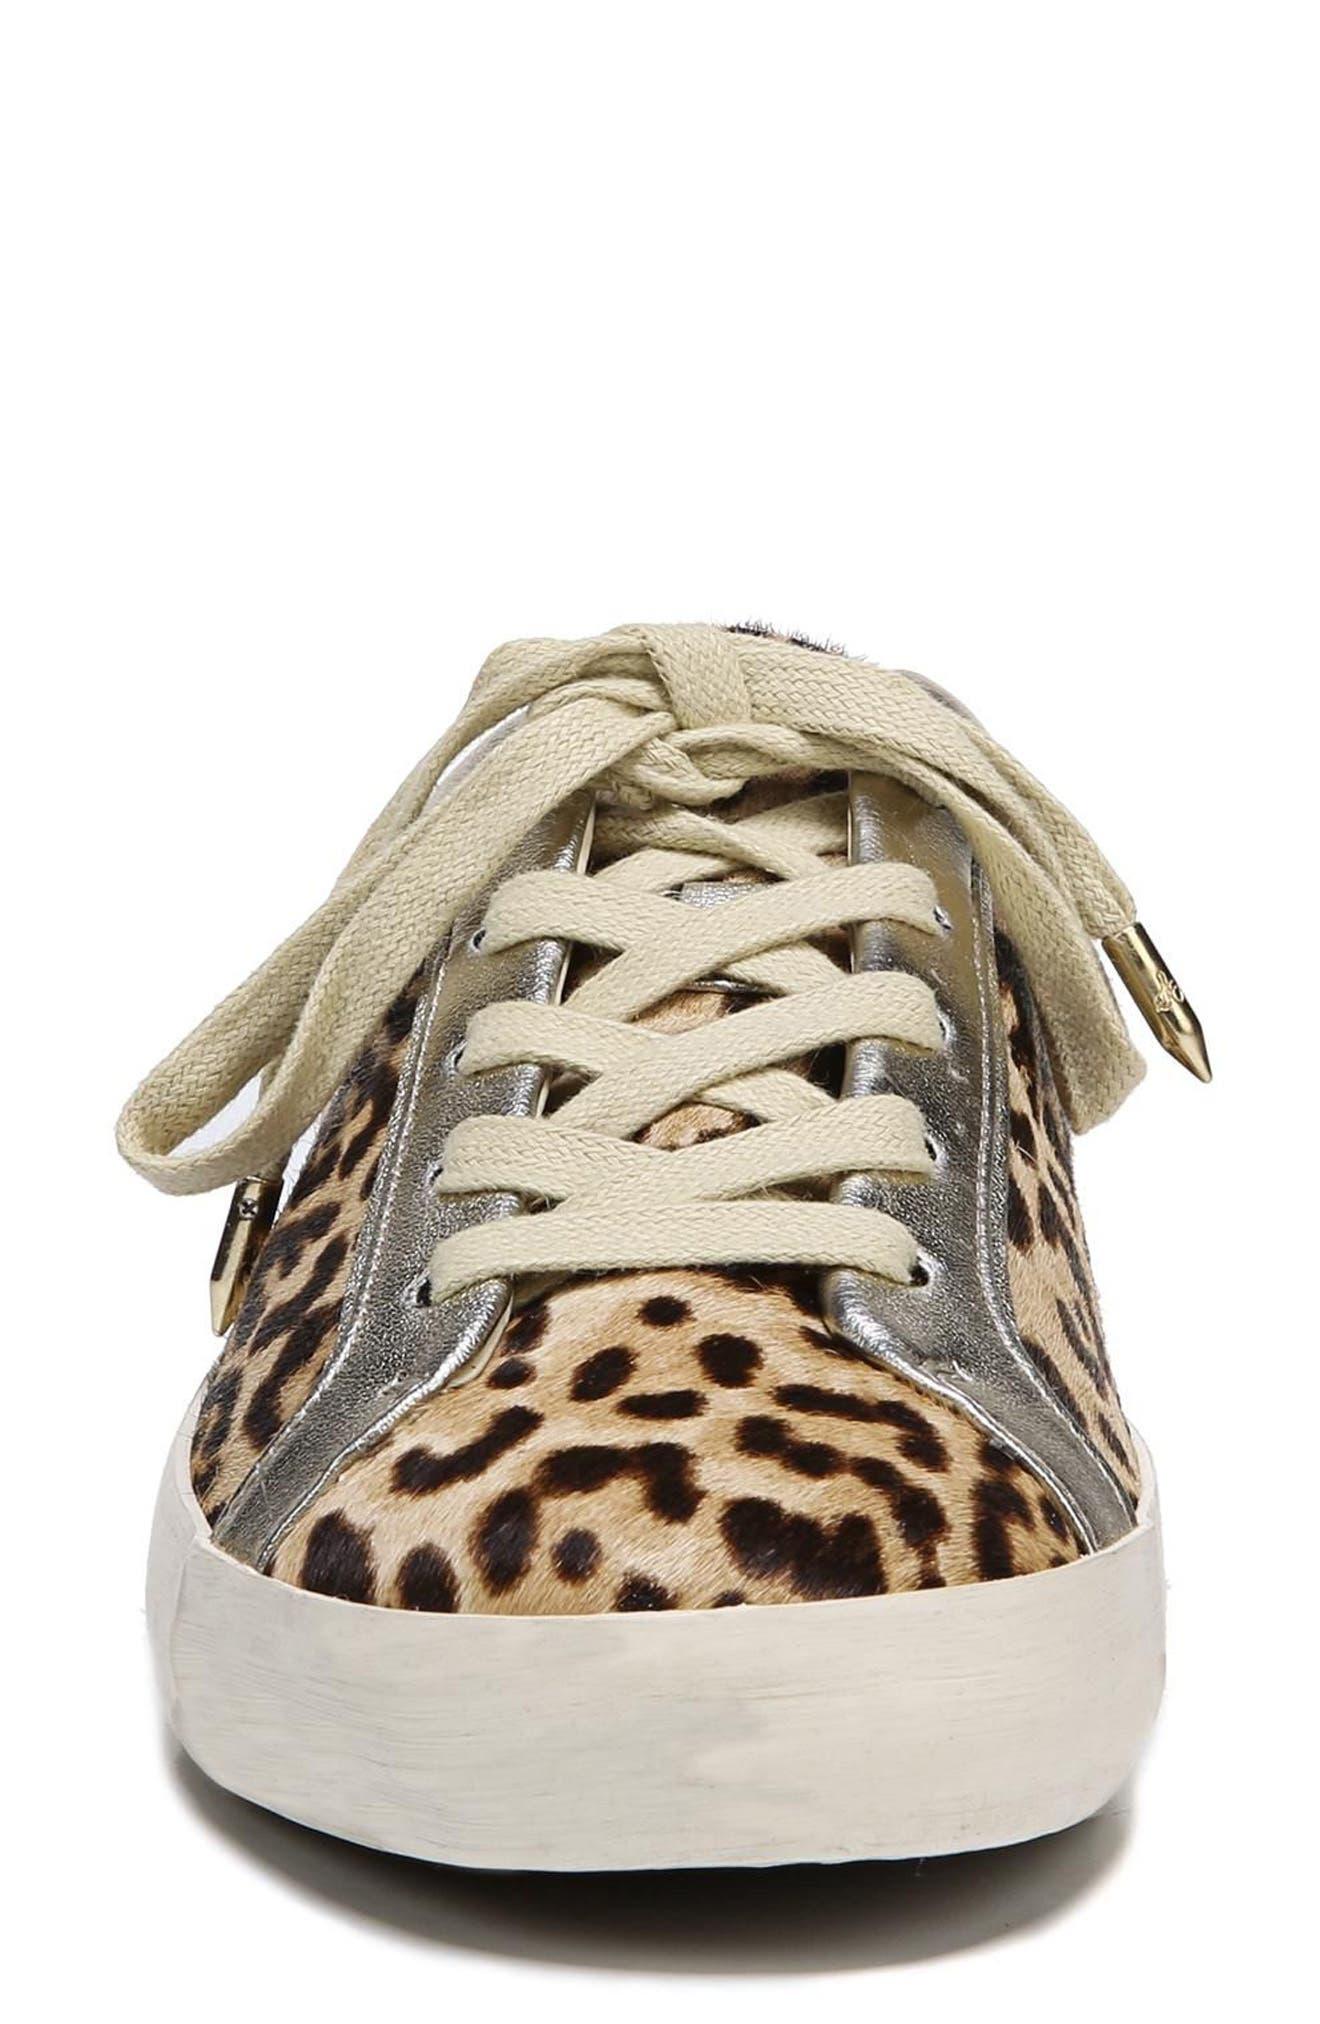 Britton 2 Sneaker,                             Alternate thumbnail 5, color,                             Leopard Brahma Hair